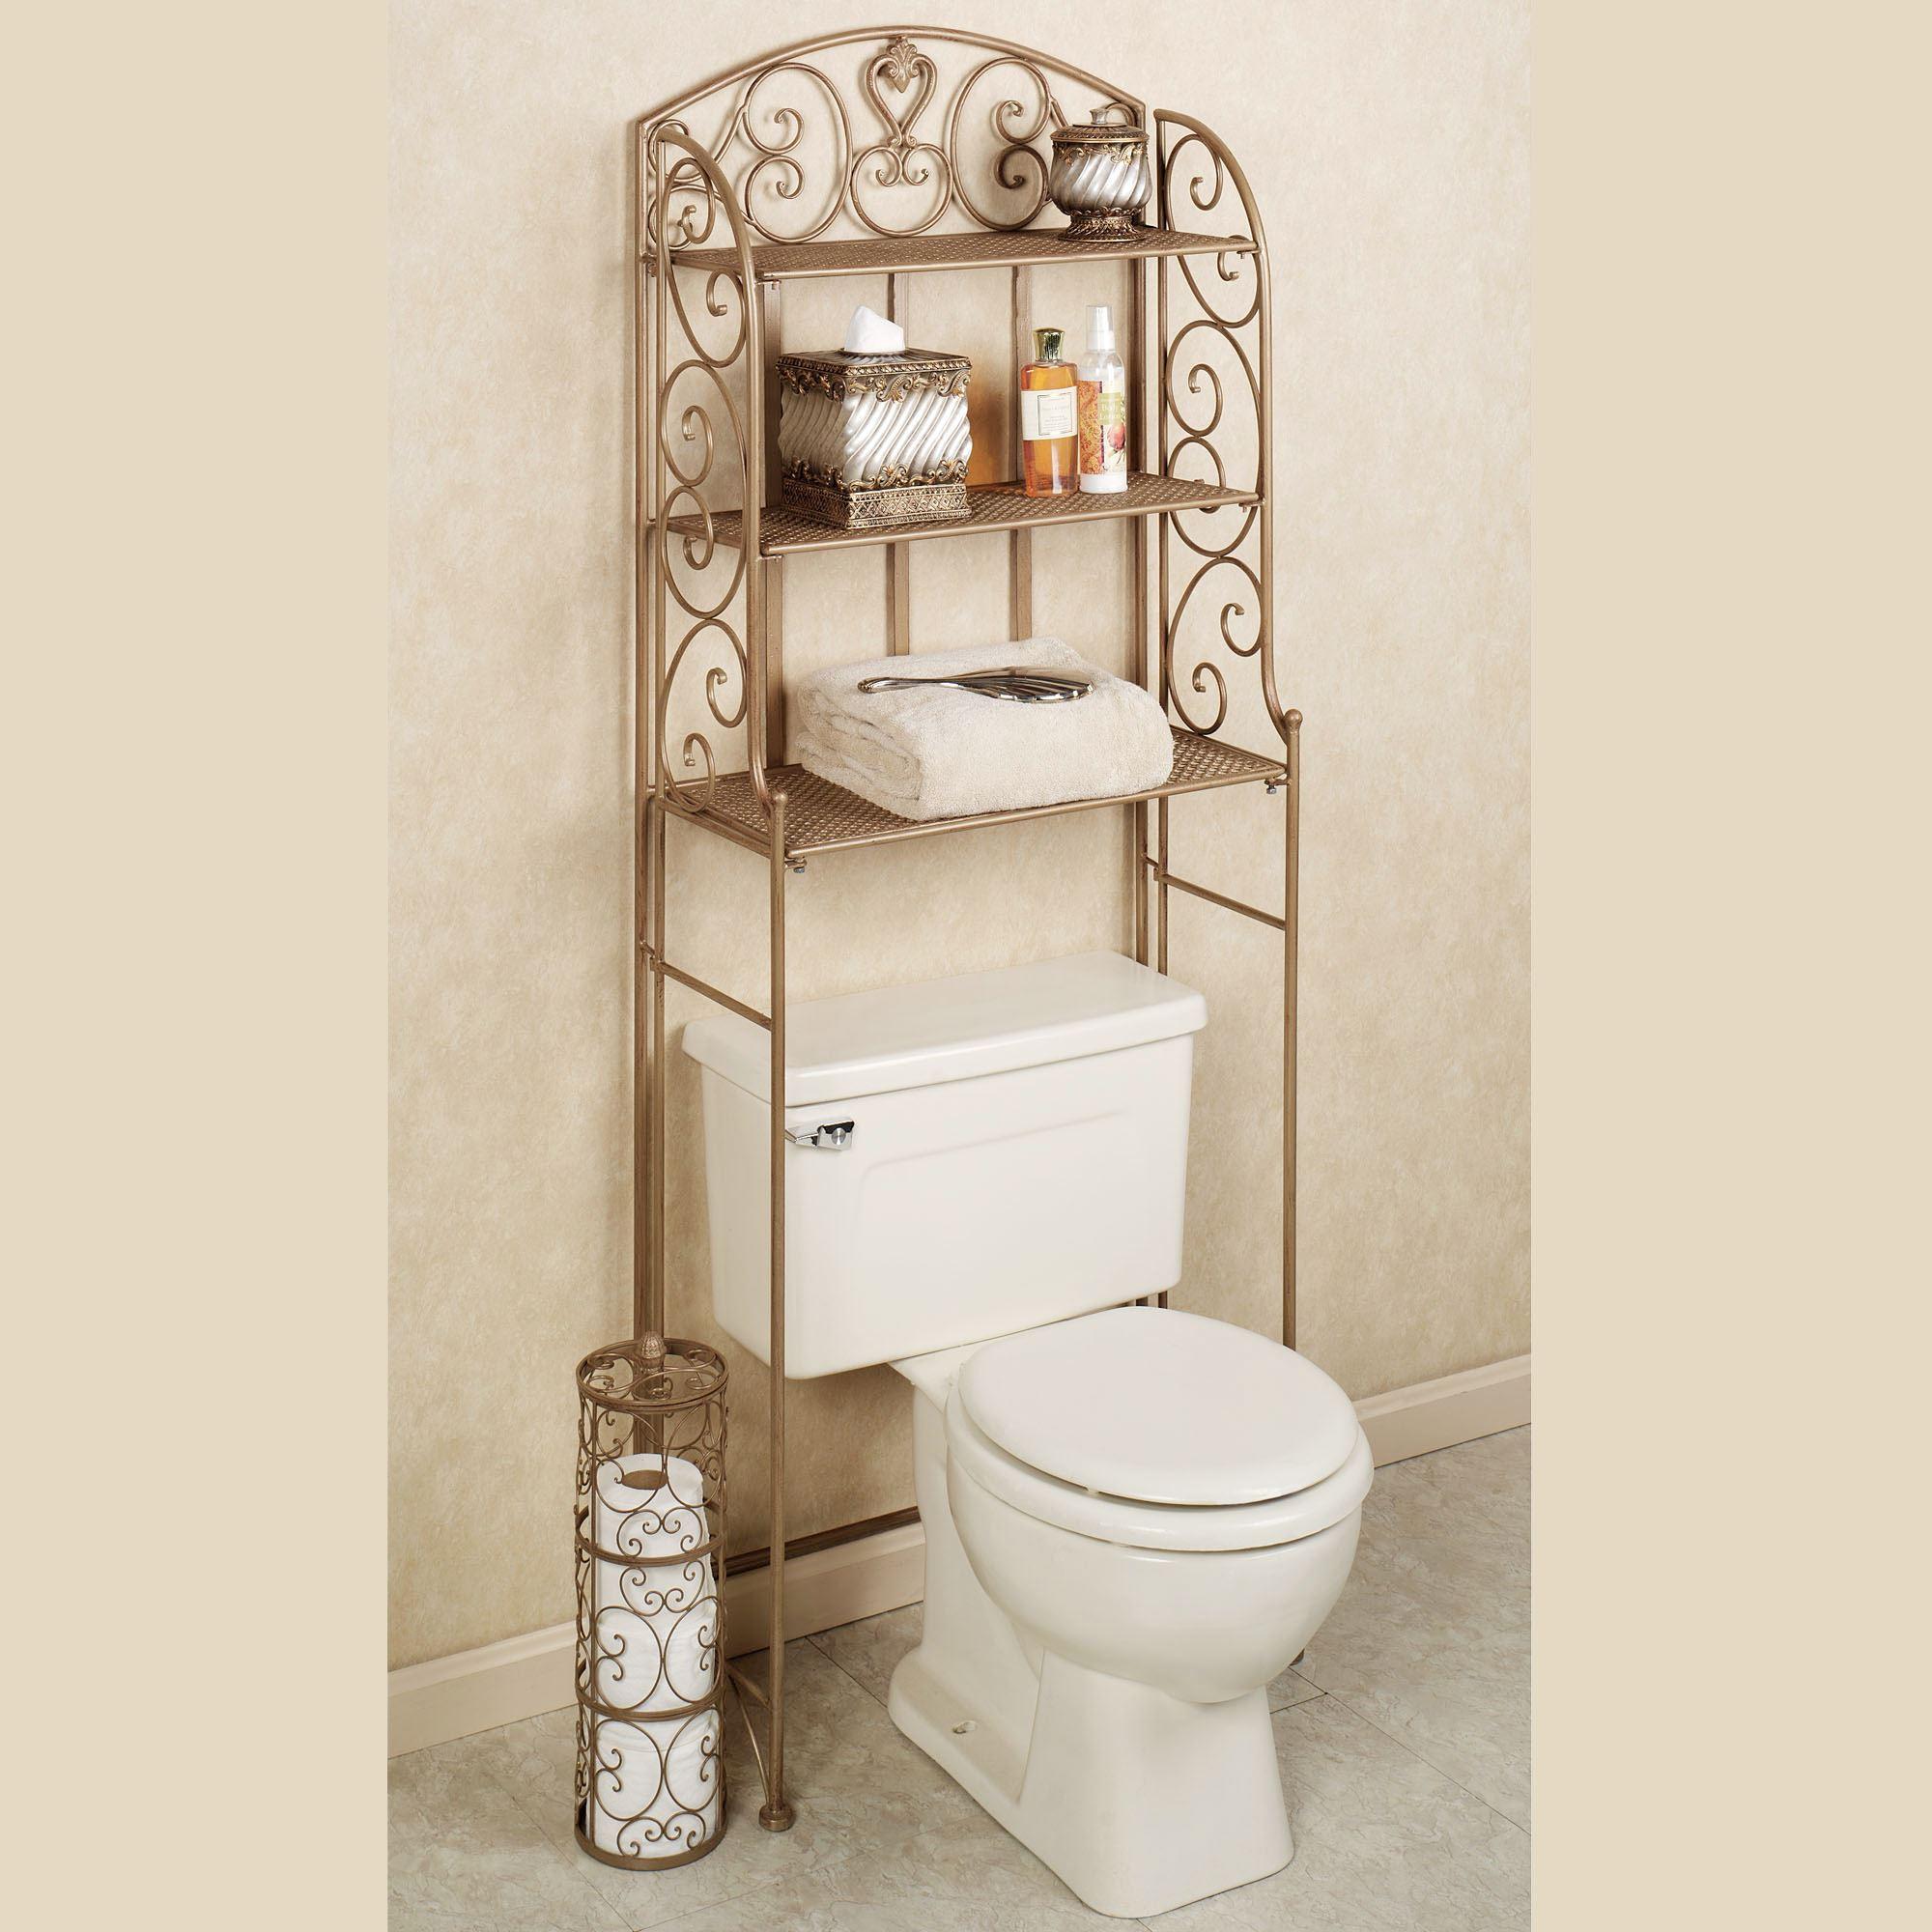 Fullsize Of Bathroom Space Savers